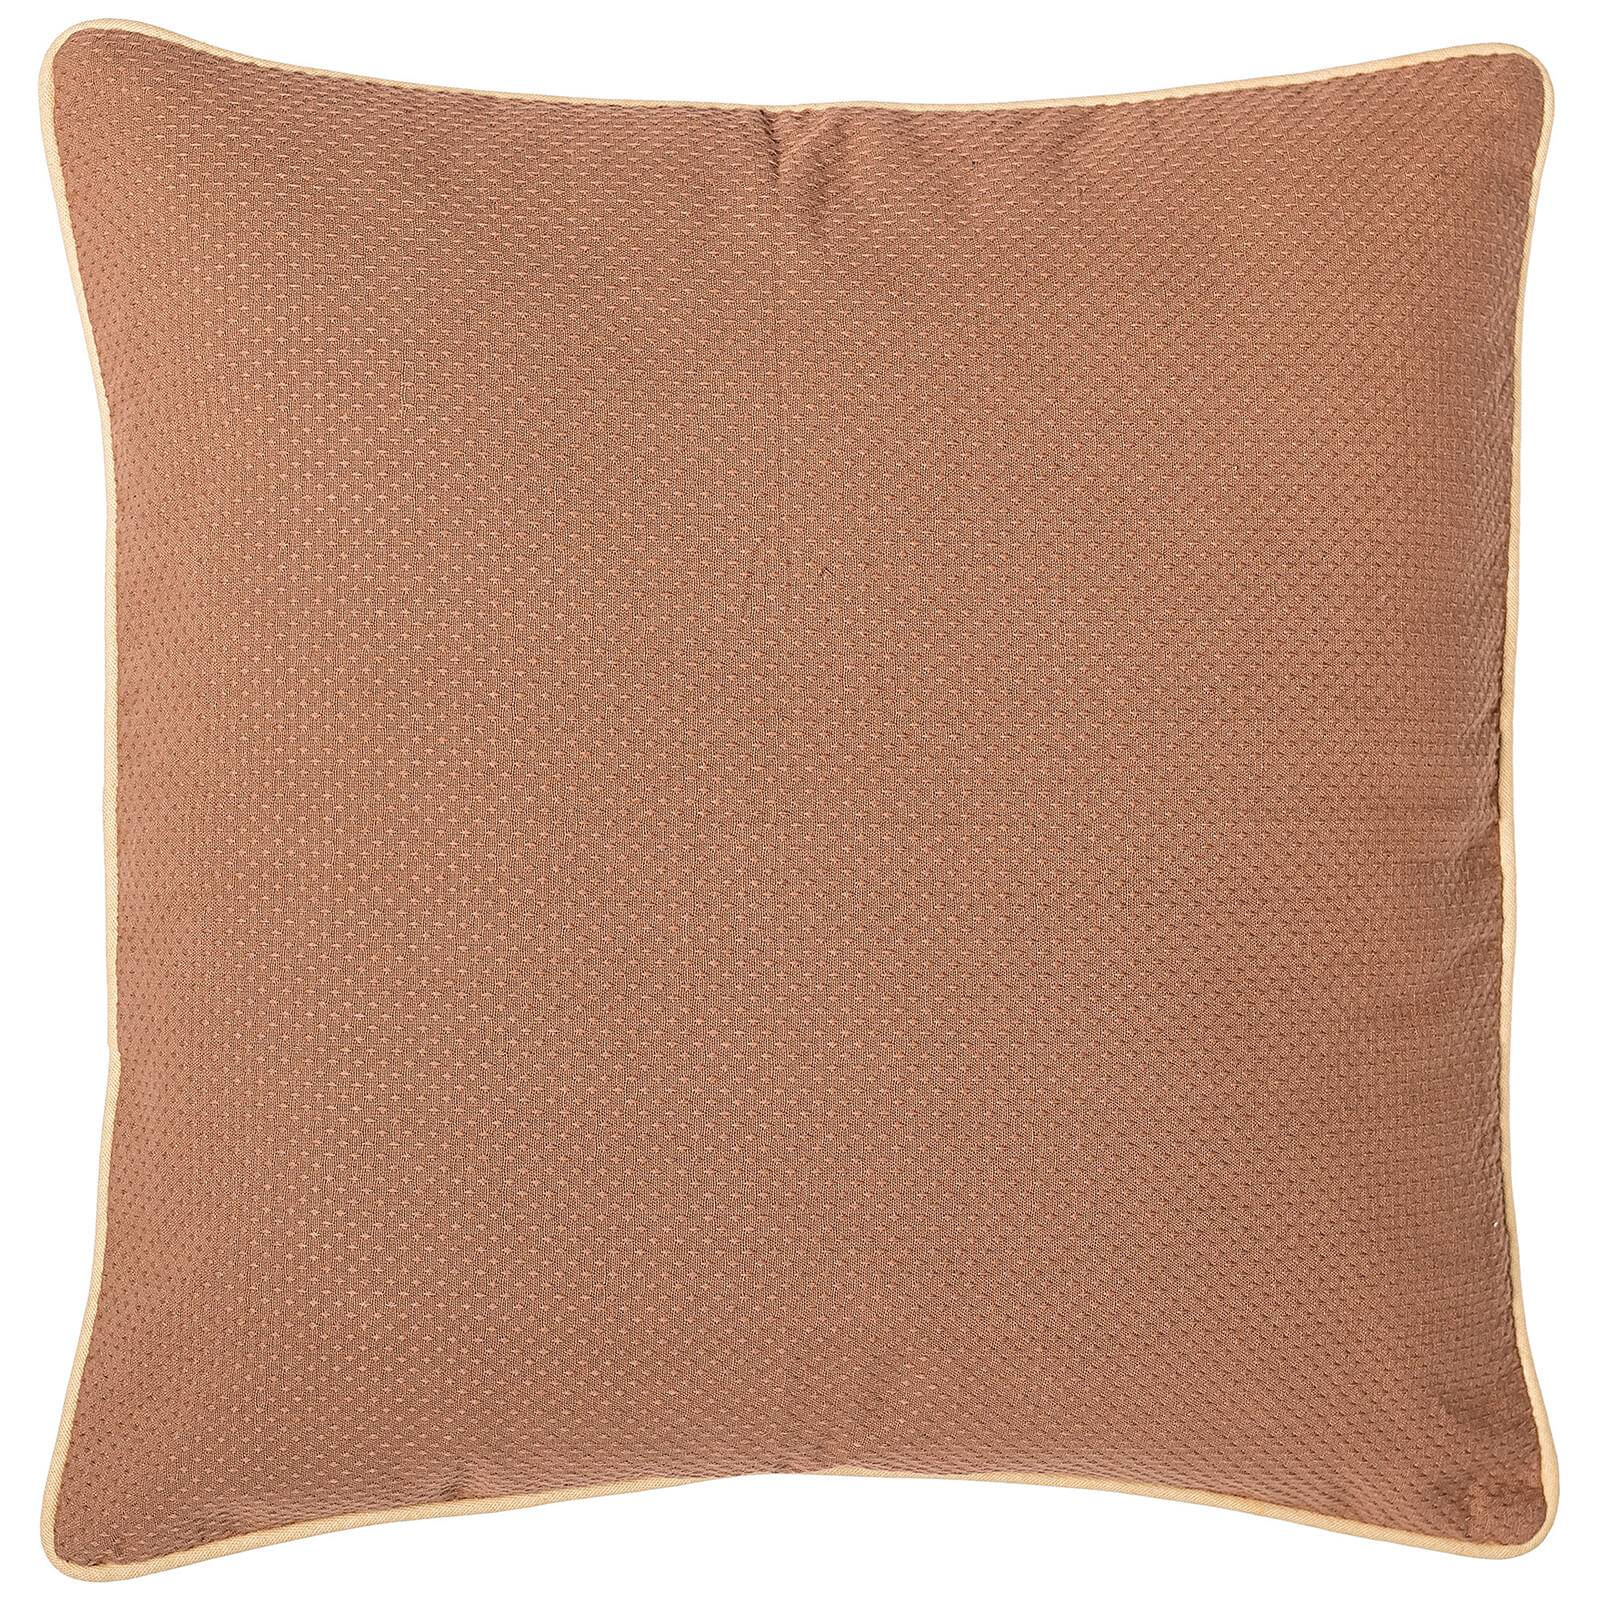 Bloomingville Cotton Cushion - Brown